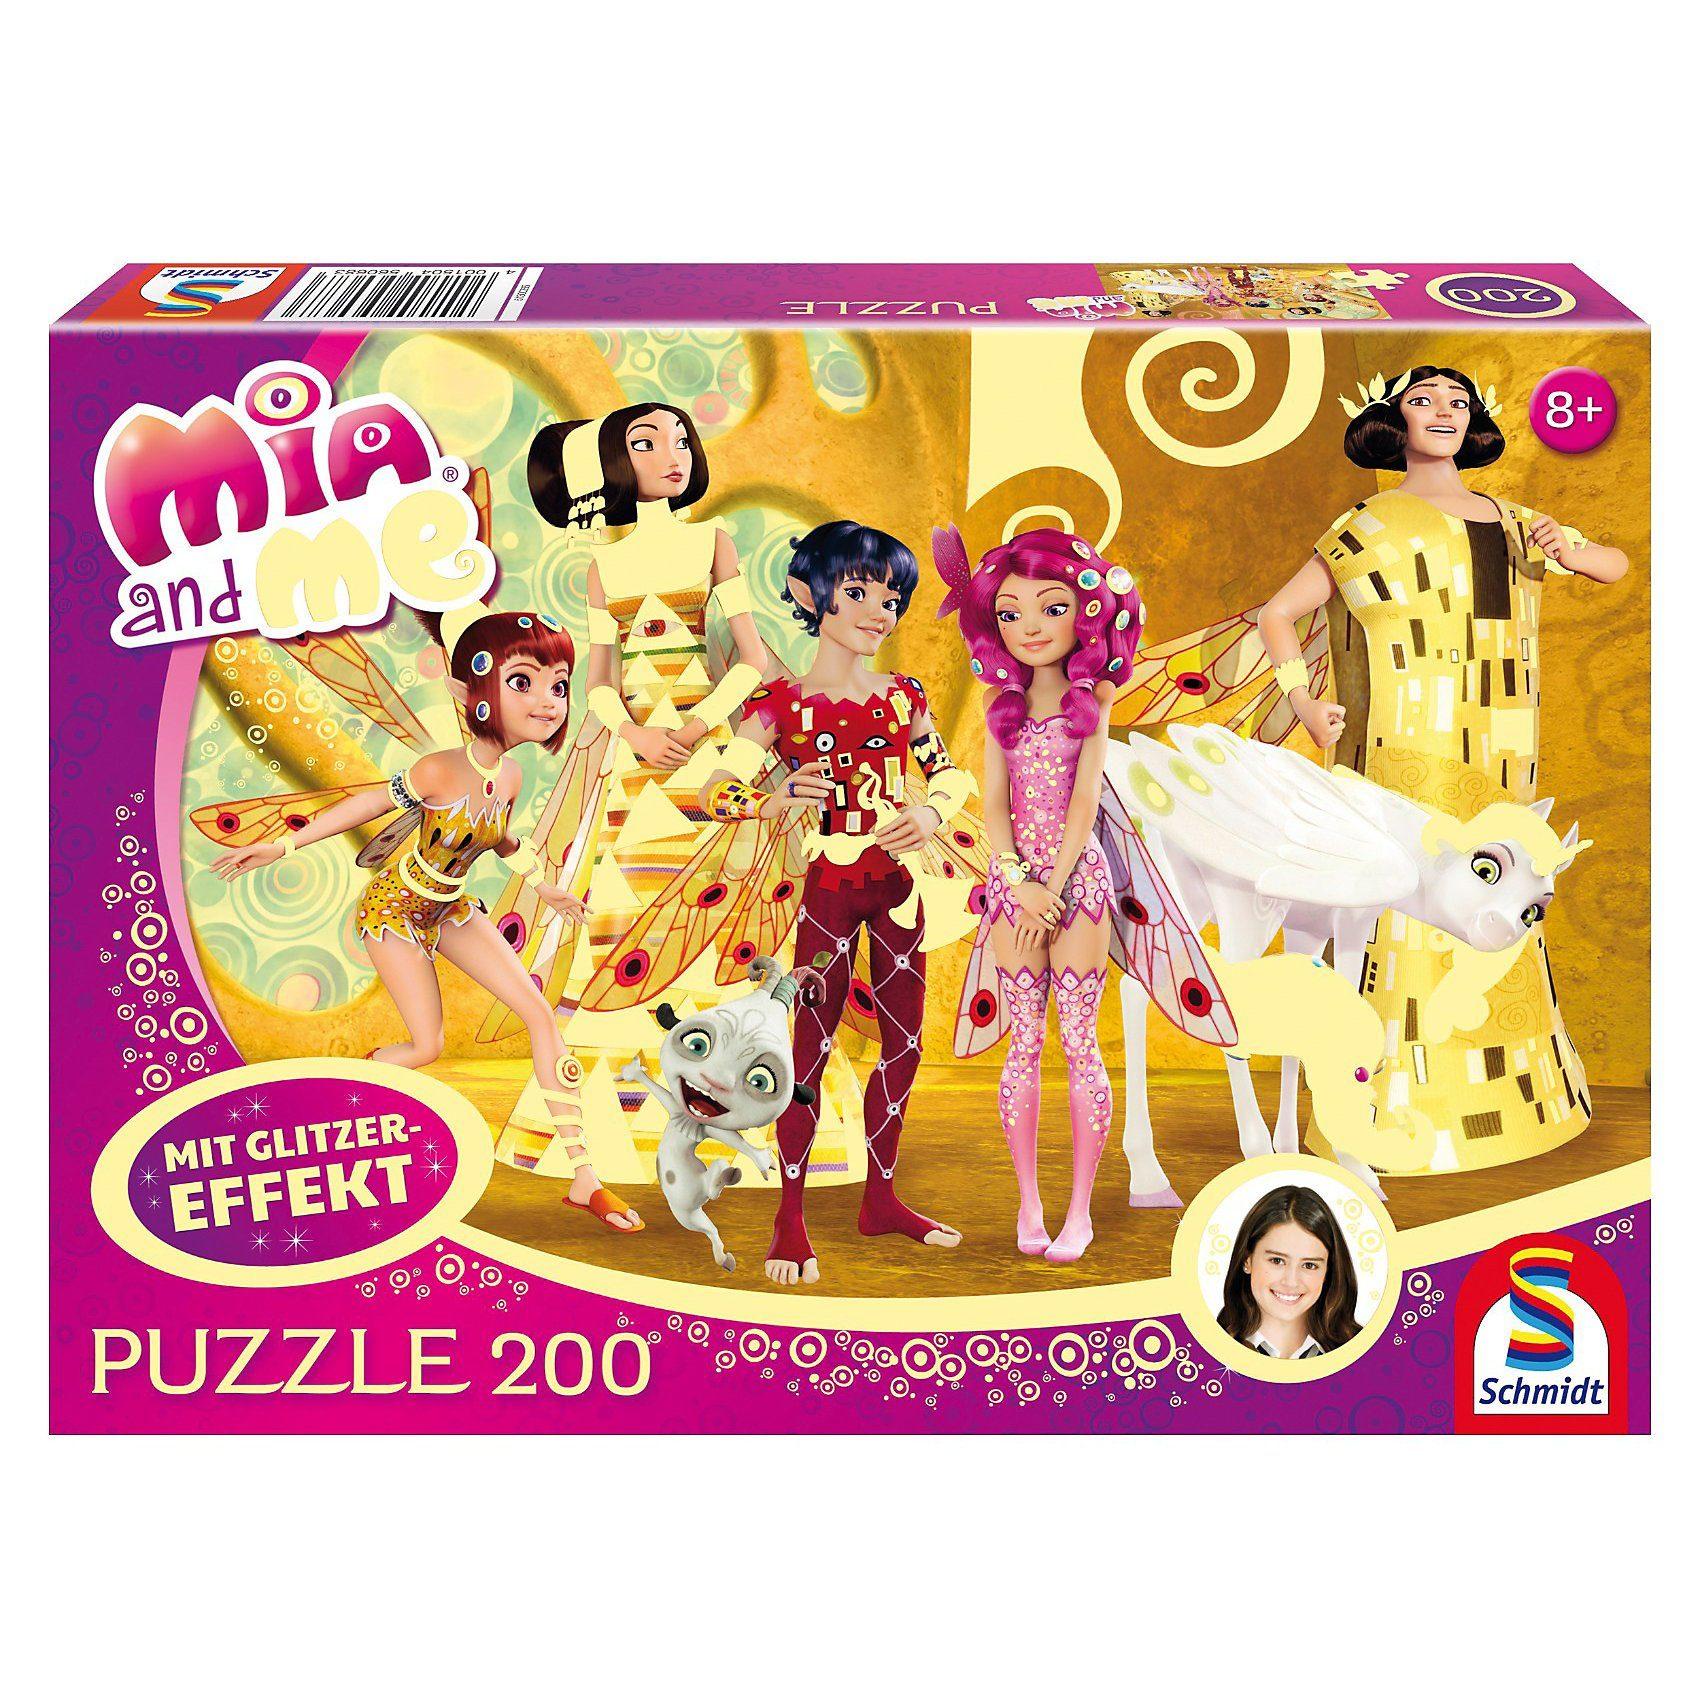 Schmidt Spiele Glitzerpuzzle Mia and Me - Mia im Elfenpalast - 200 Teile